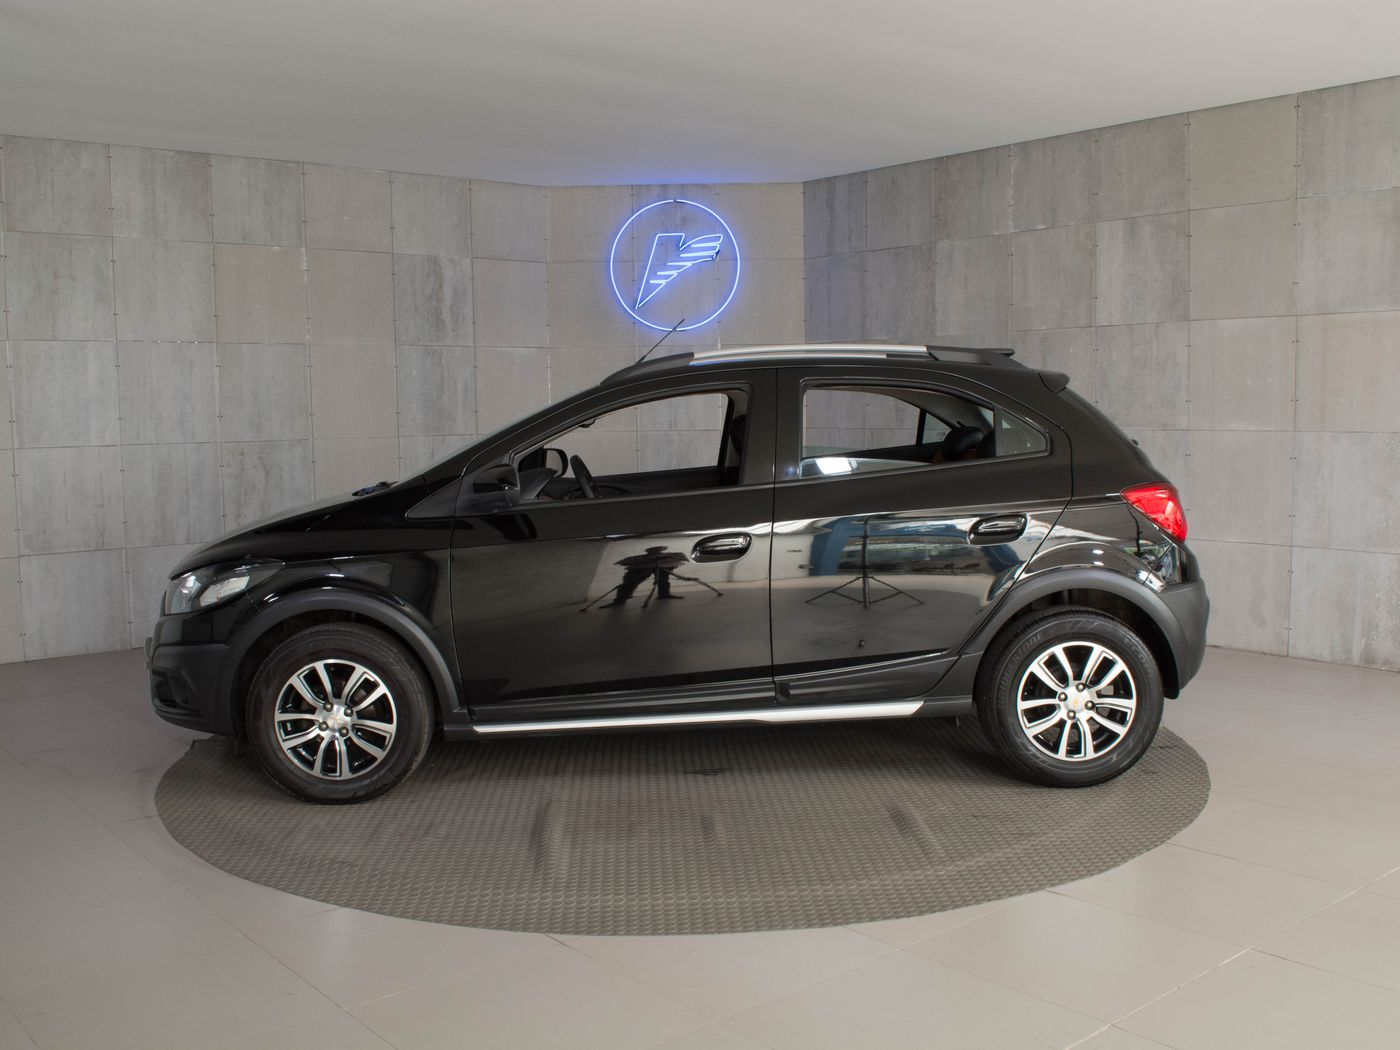 Chevrolet ONIX HATCH ACTIV 1.4 8V Flex 5p Mec.